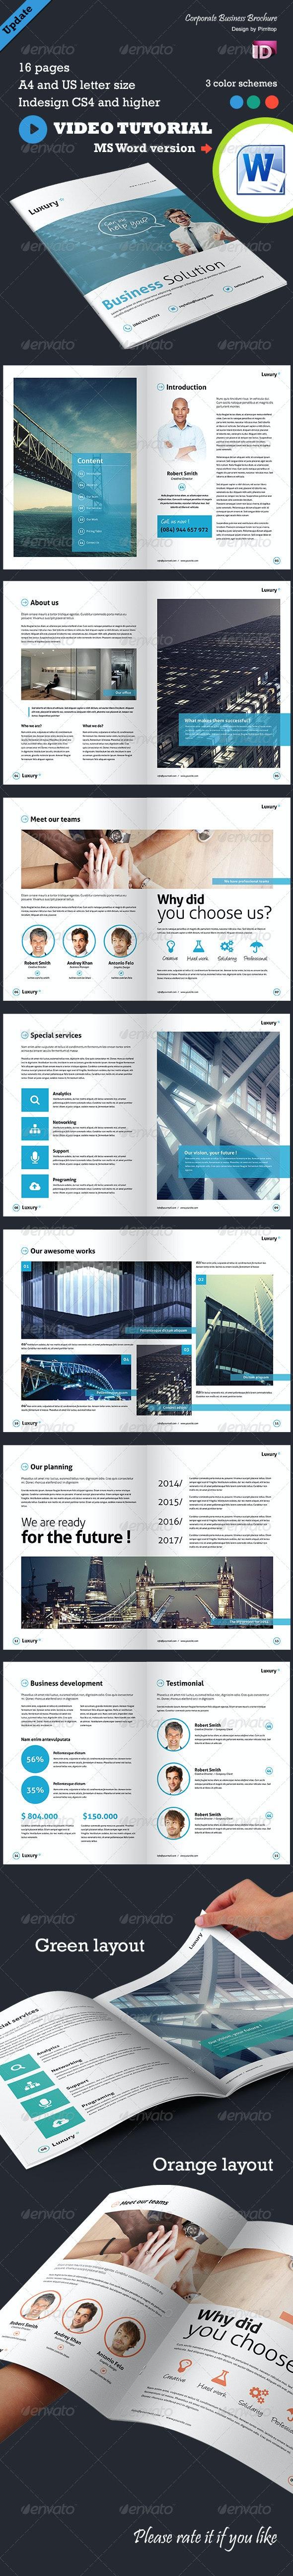 Corporate Business Brochure - Luxury - Corporate Brochures